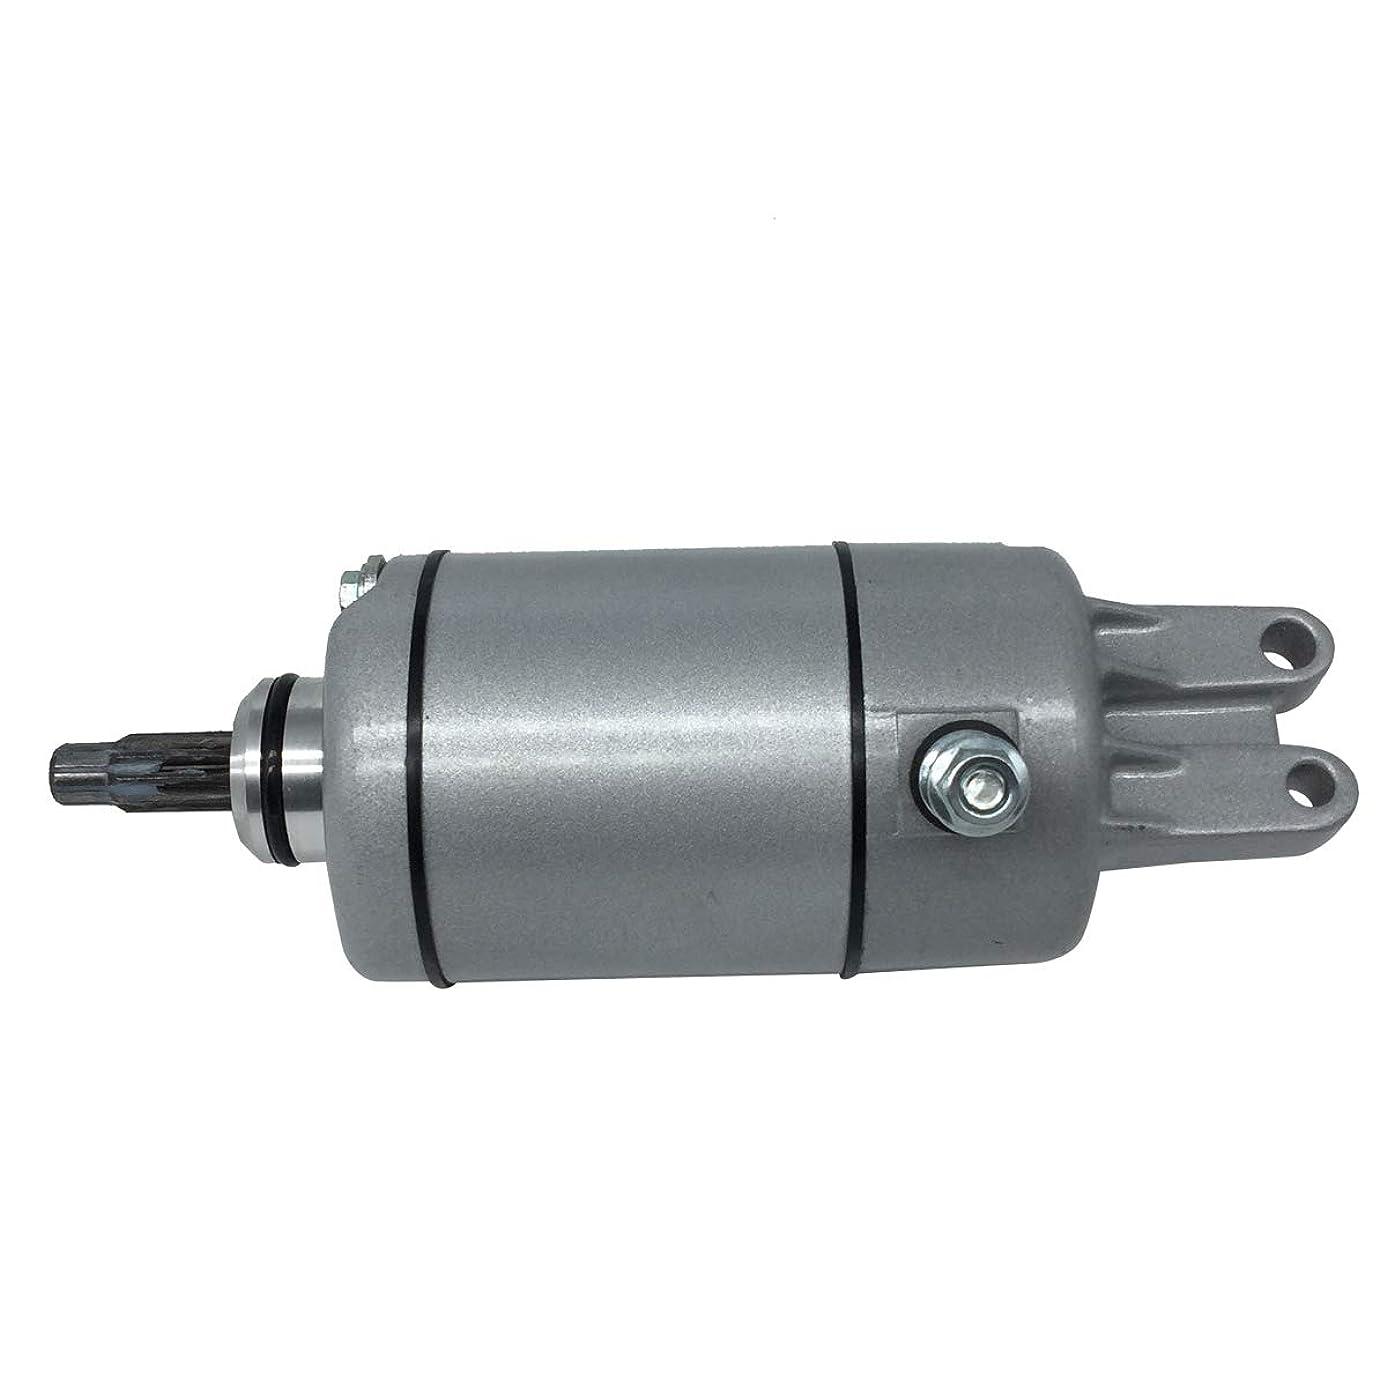 Hity Motor 18638 Starter For Honda TRX400 TRX450 TRX500 FE ES FourTrax Foreman Rincon 4x4 95-2009 REPLACES HONDA 31200-HM7-003, 31200-HM7-A41